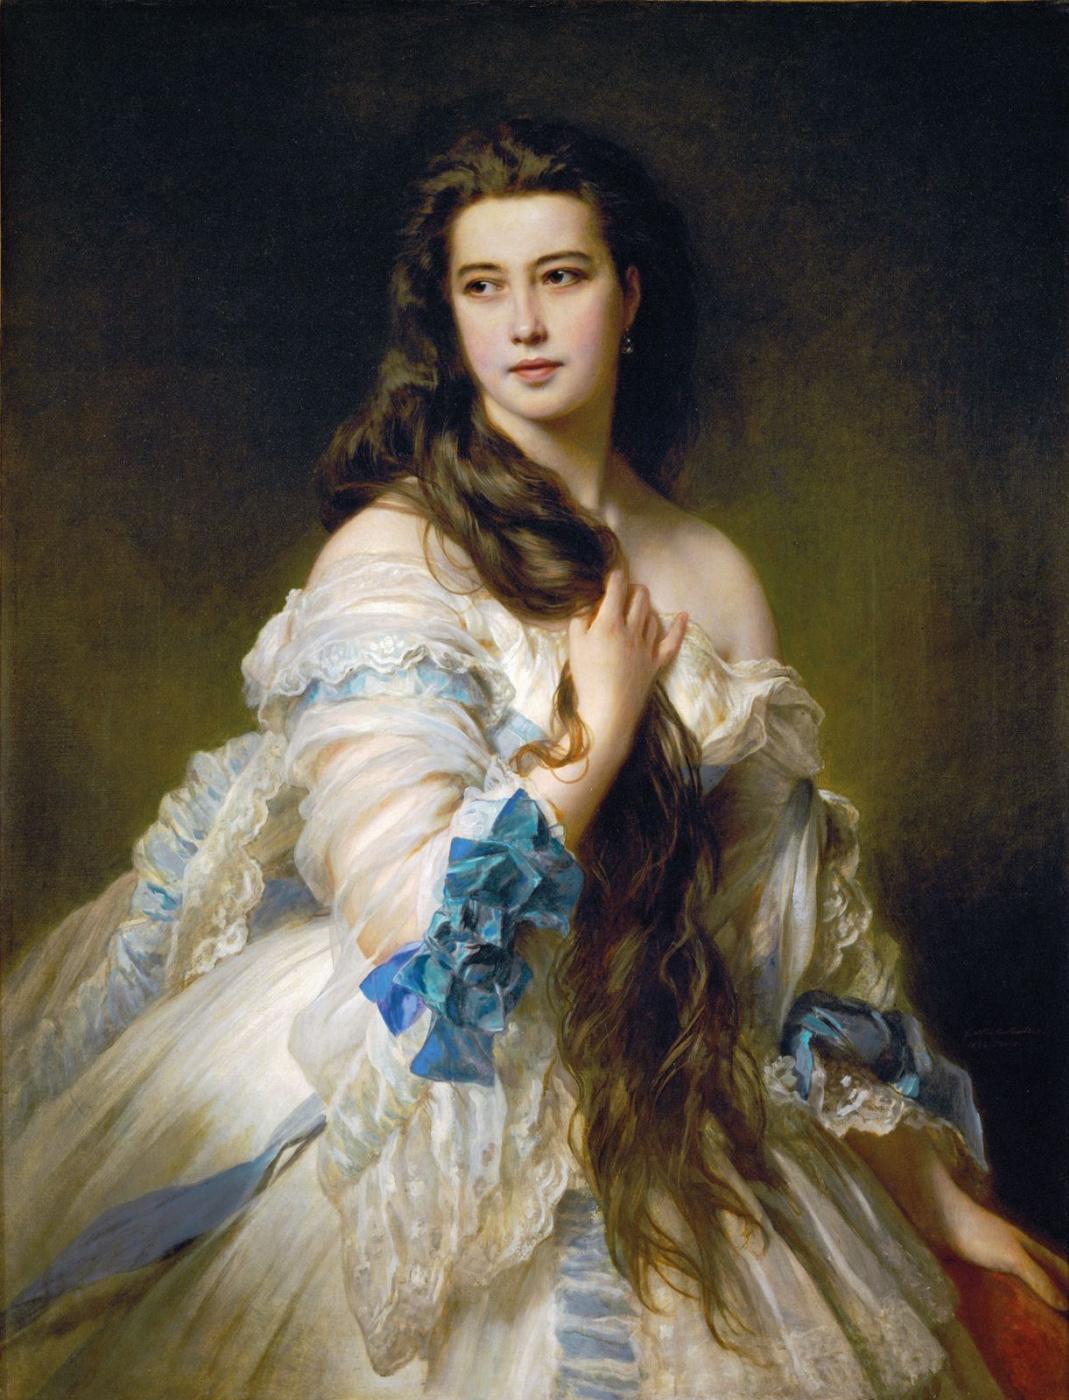 Franz Xaver Winterhalter. Varvara Rimsky-Korsakov (Madame Rimsky-Korsakov)